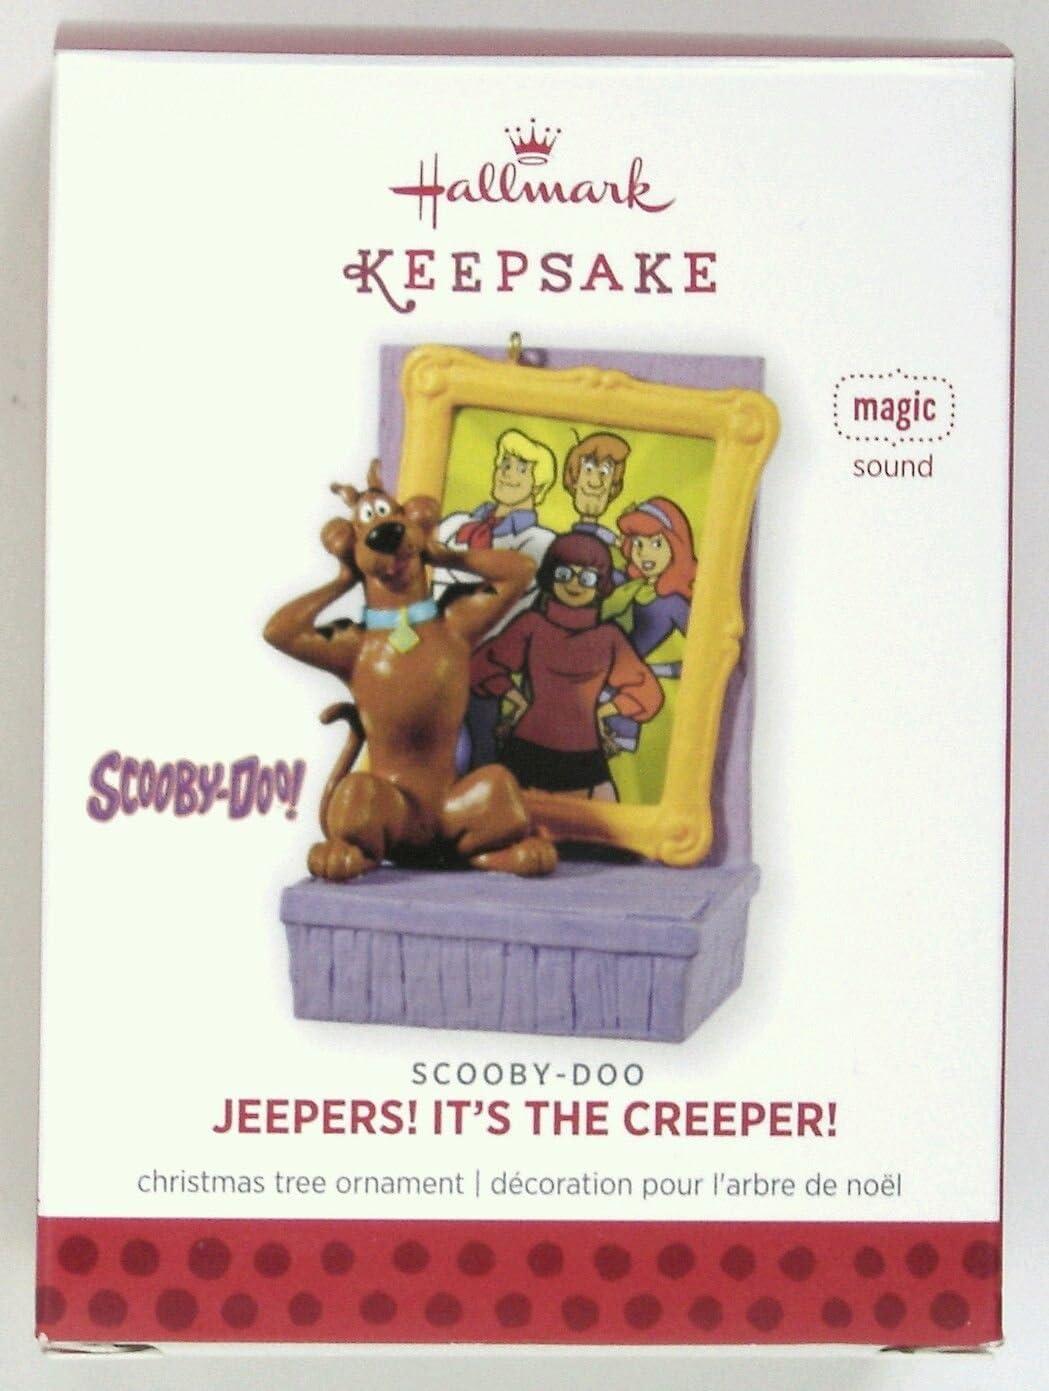 Hallmark Jeepers! It's The Creeper! Scooby-Doo 2013 Keepsake Ornament